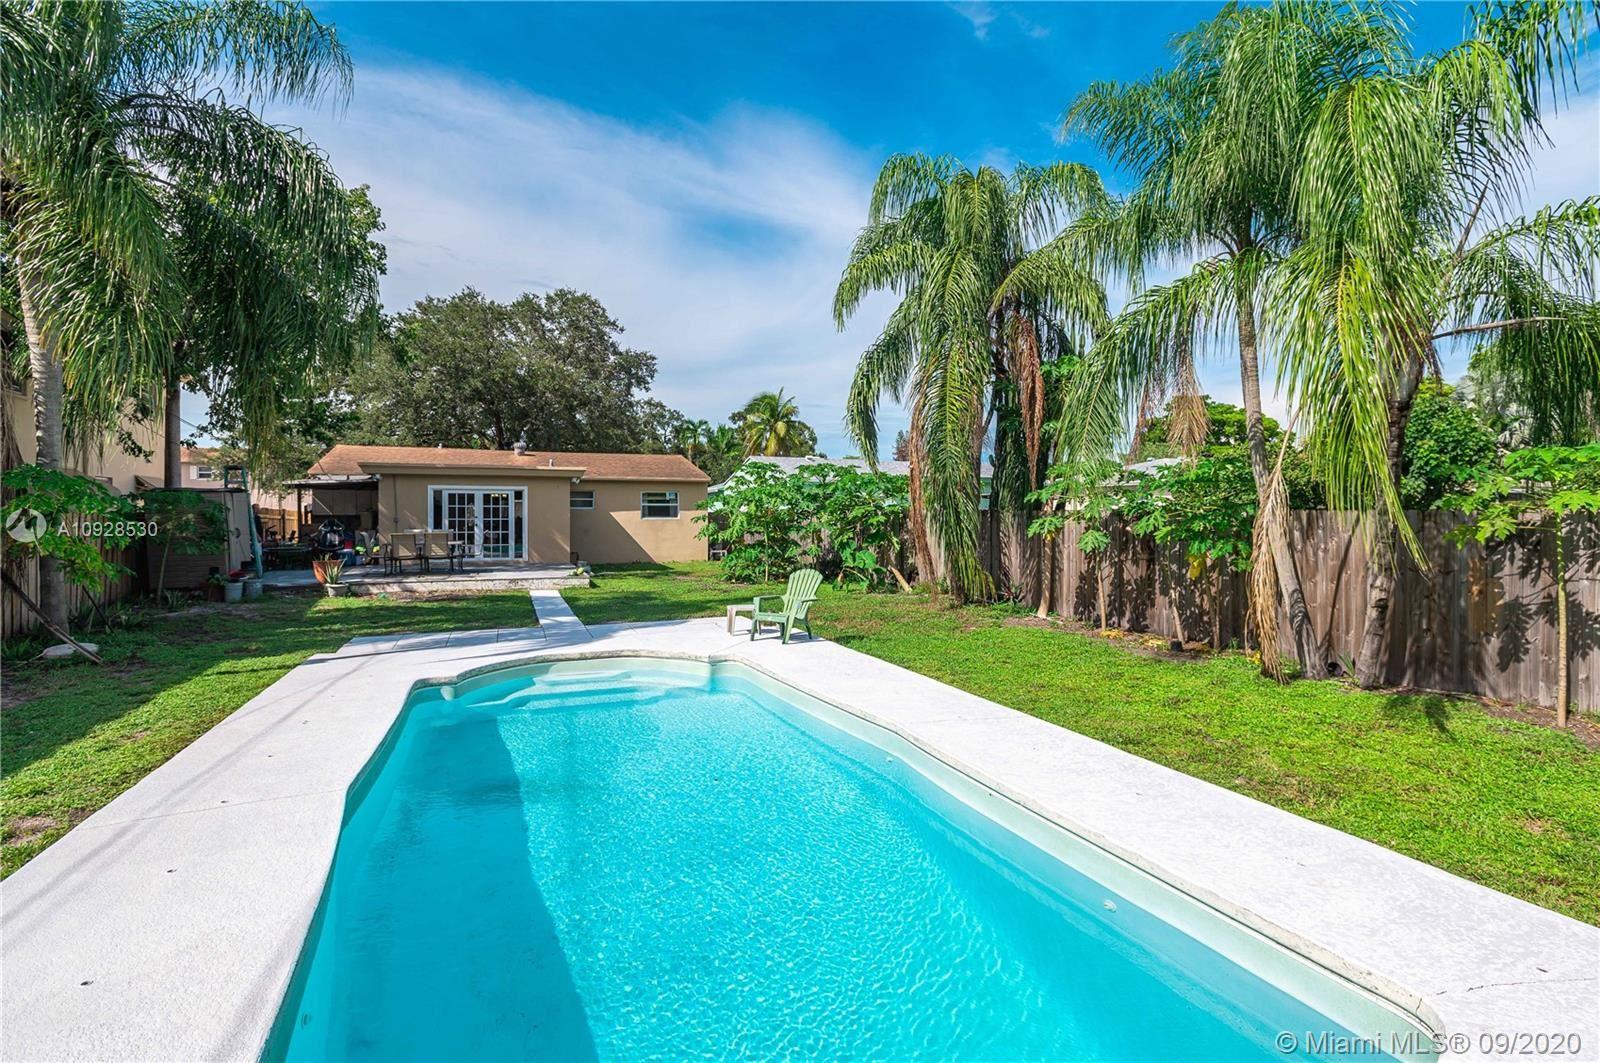 2830 Taylor St, Hollywood, FL 33020 - #: A10928530